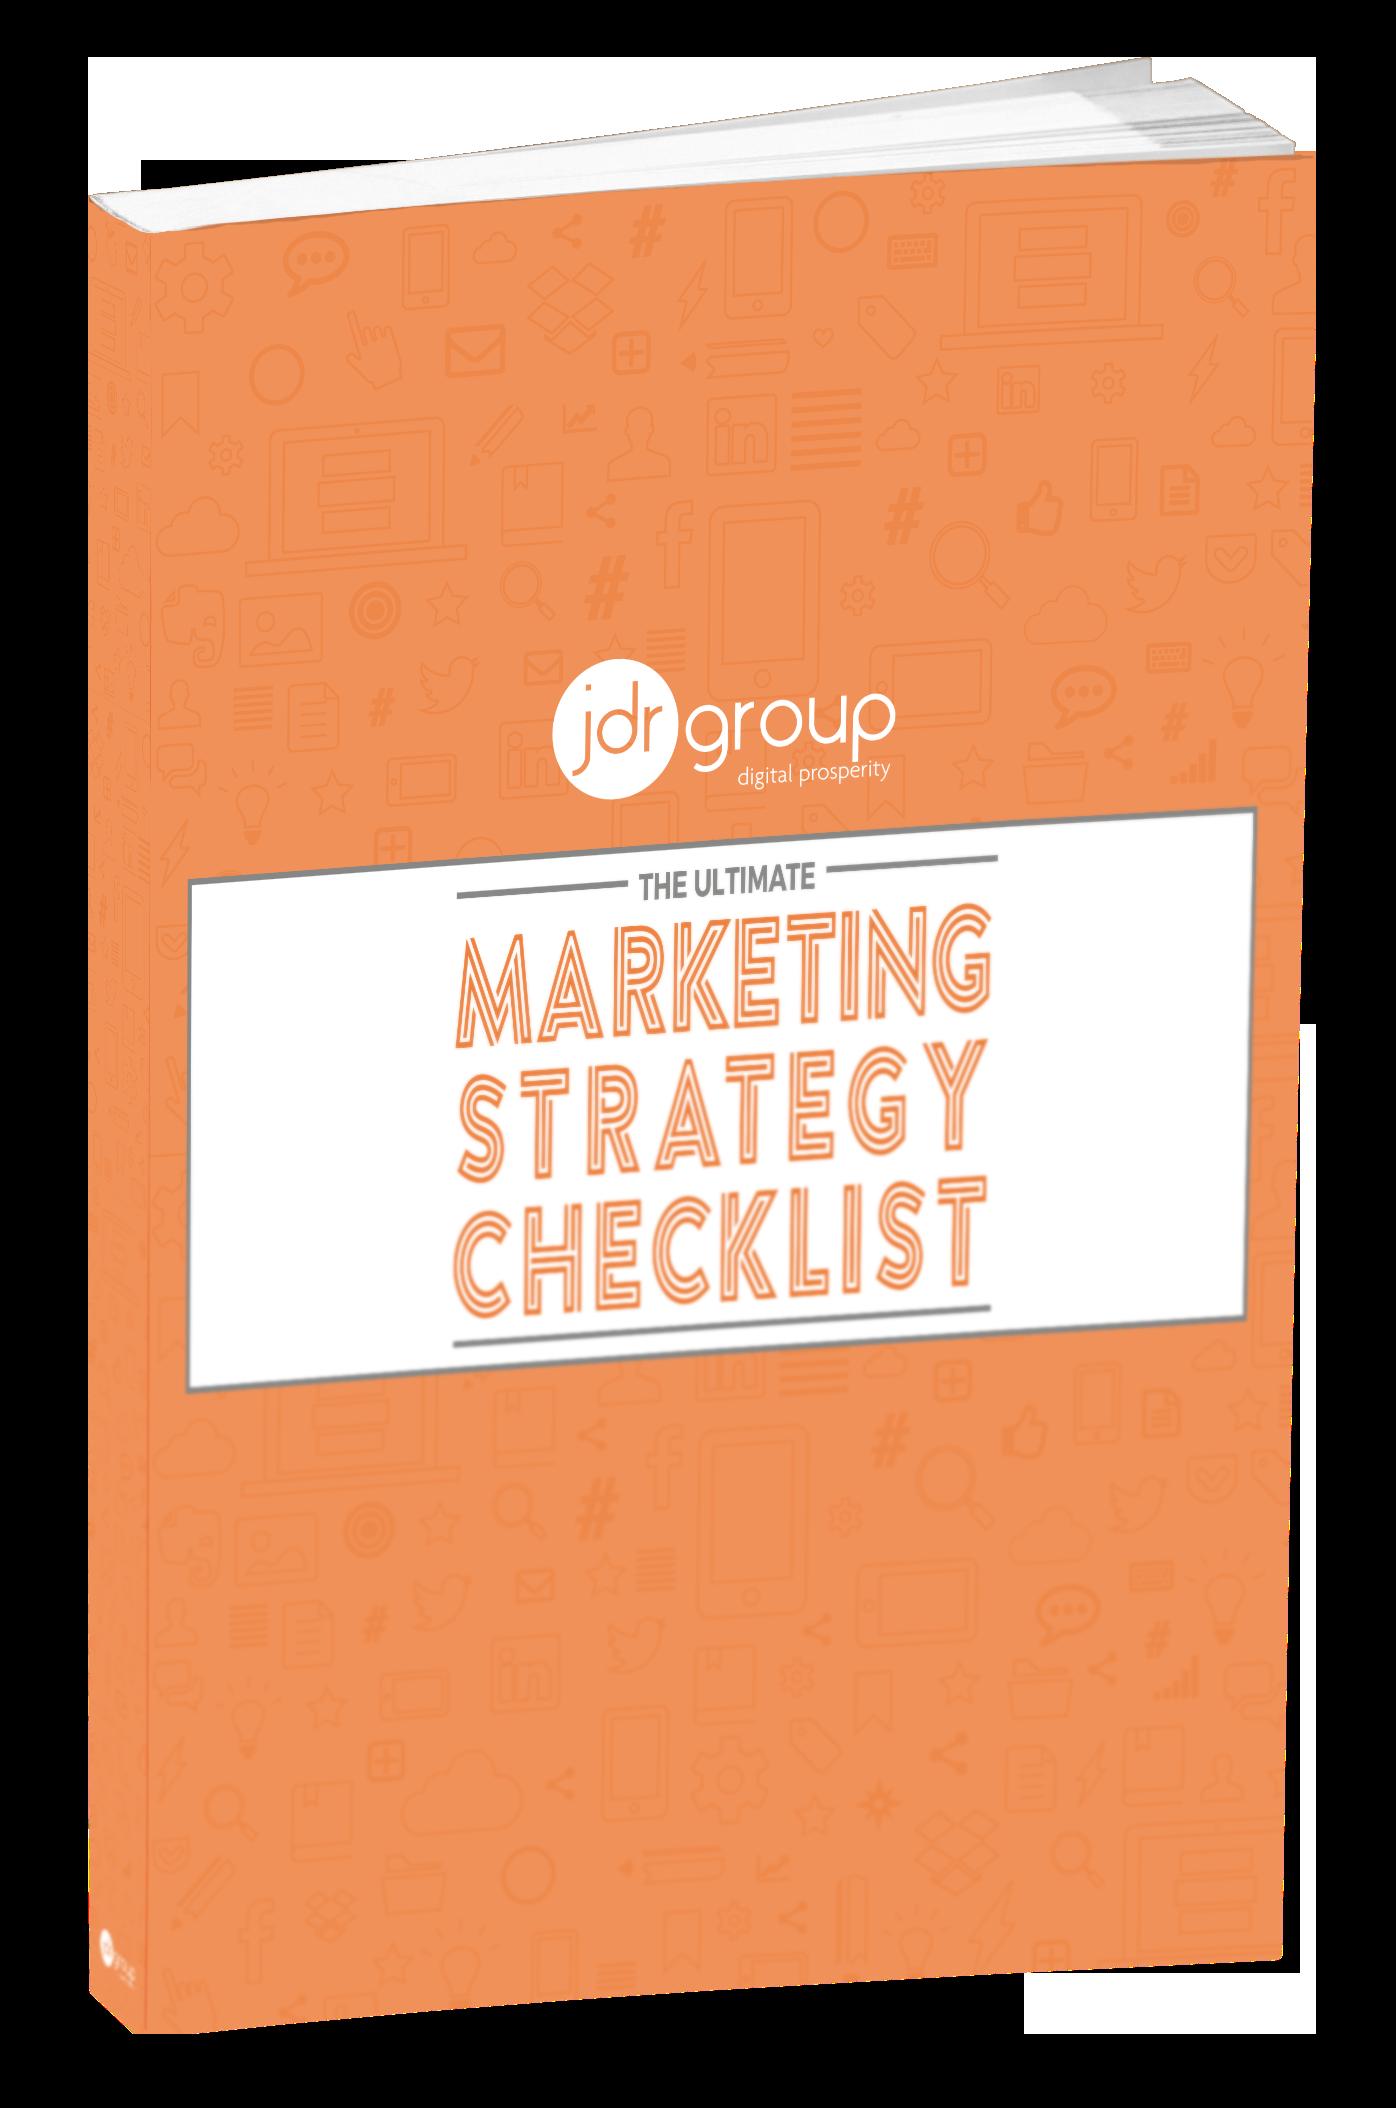 Ebook-Cover-JDR-Marketing-Strategy-Checklist-7